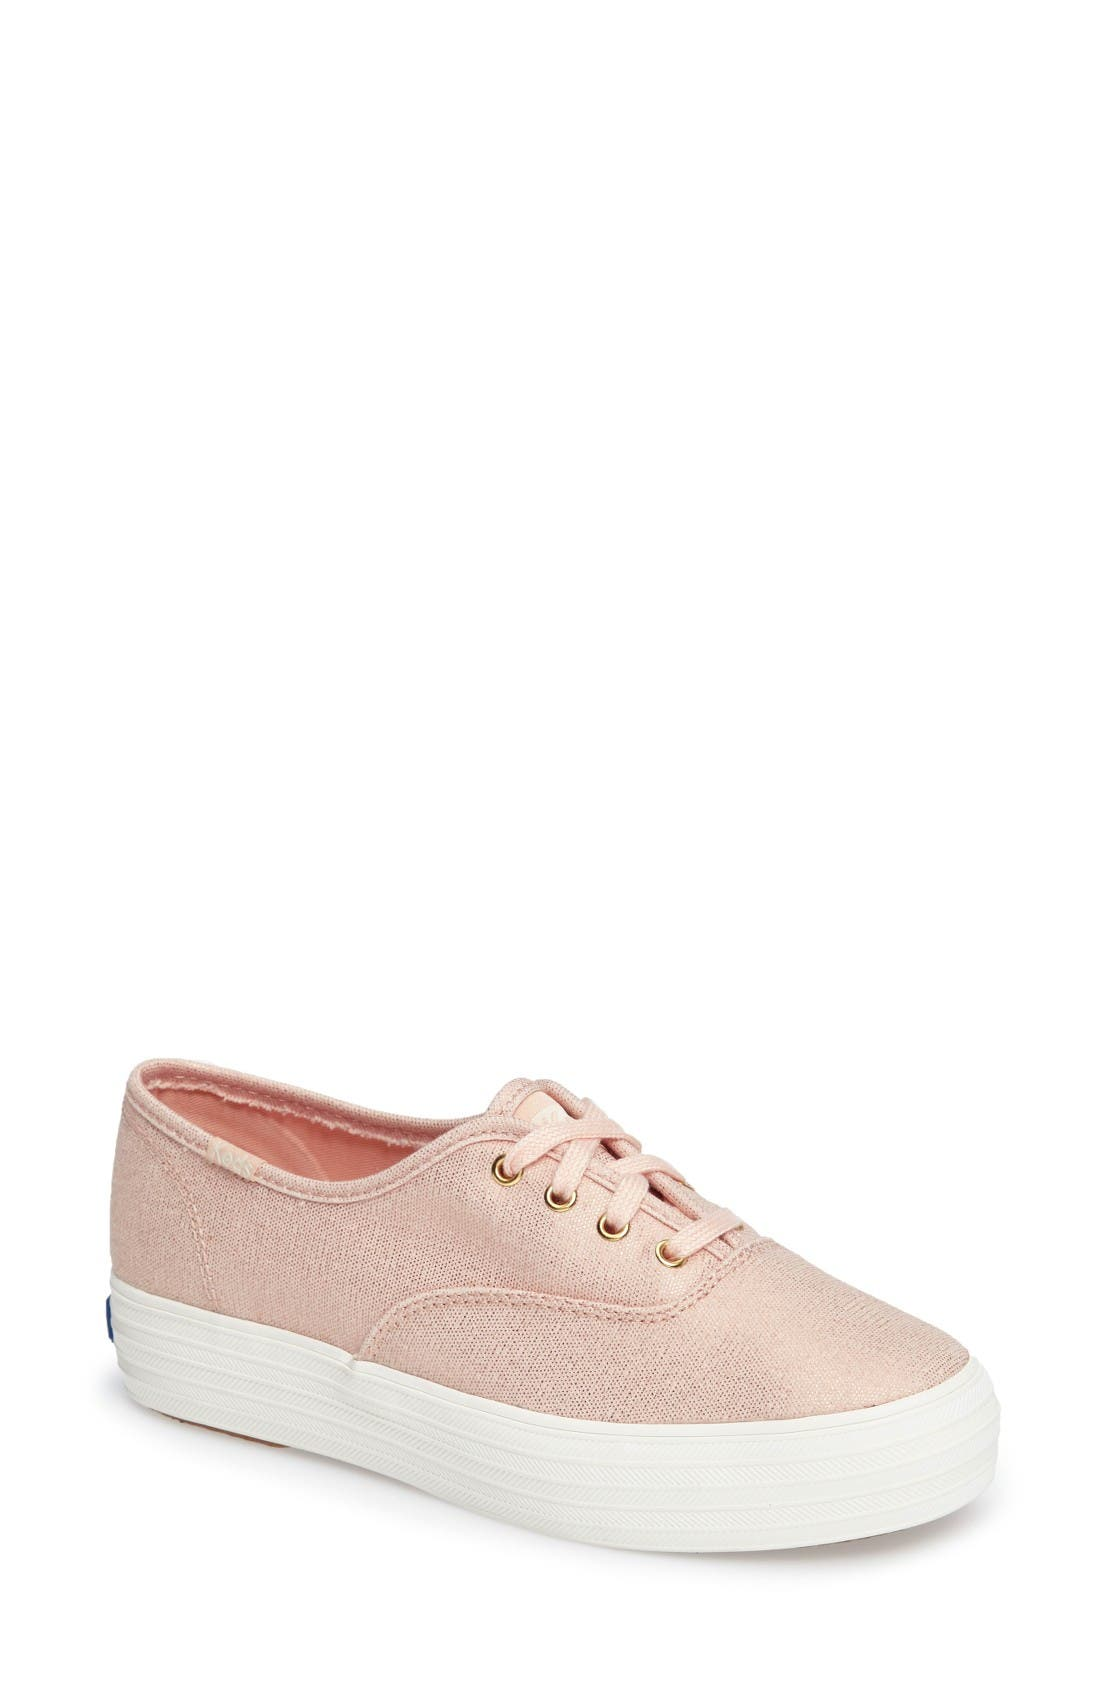 KEDS<SUP>®</SUP> Triple Deck Platform Sneaker